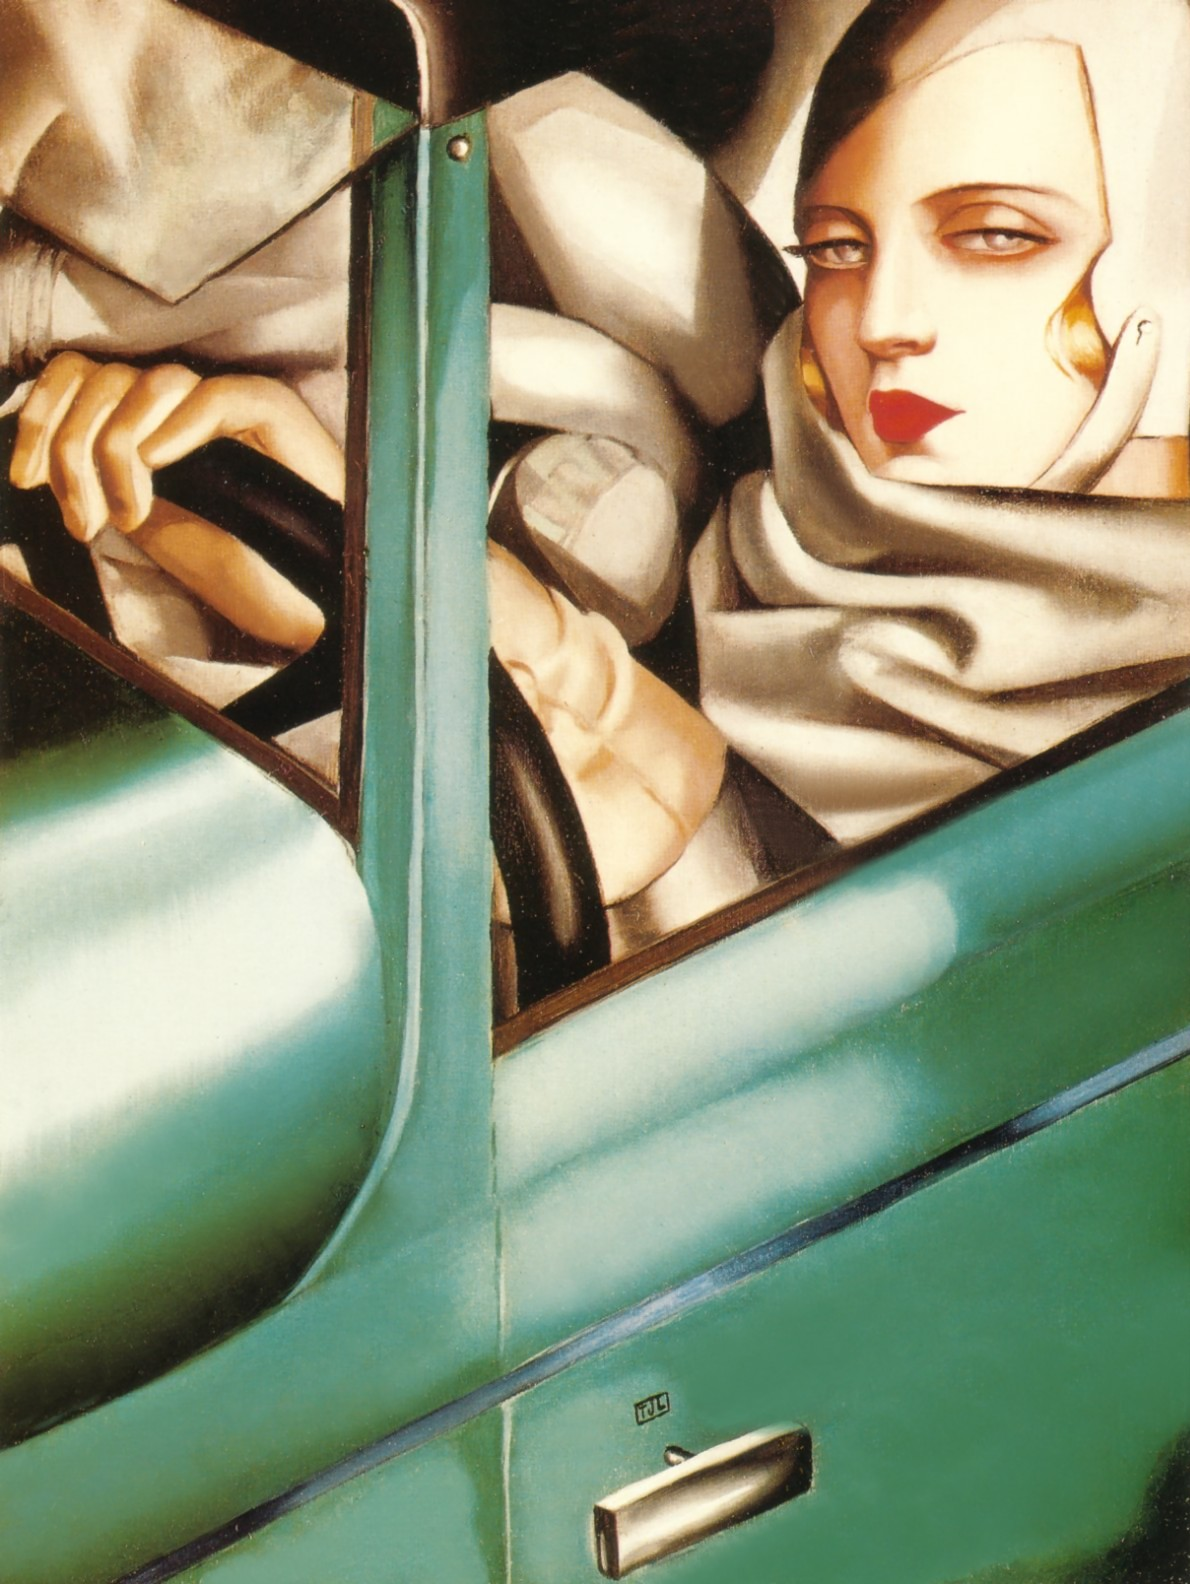 Тамара де Лемпицка. Self-Portrait in Green Bugatti, 1925